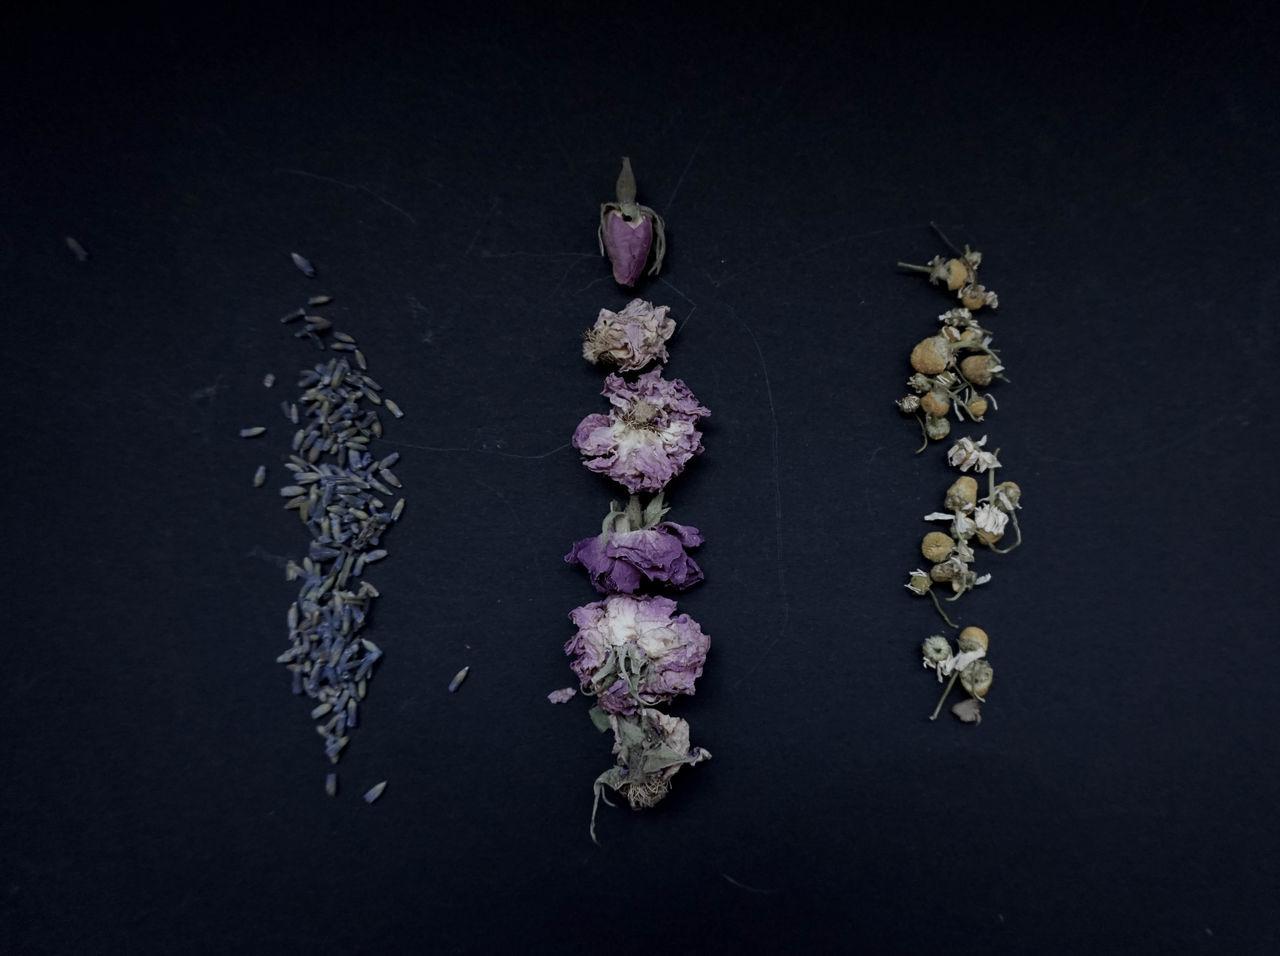 Chamomile Dark Herbal Herbs Lavender Plants Preparation  Roses